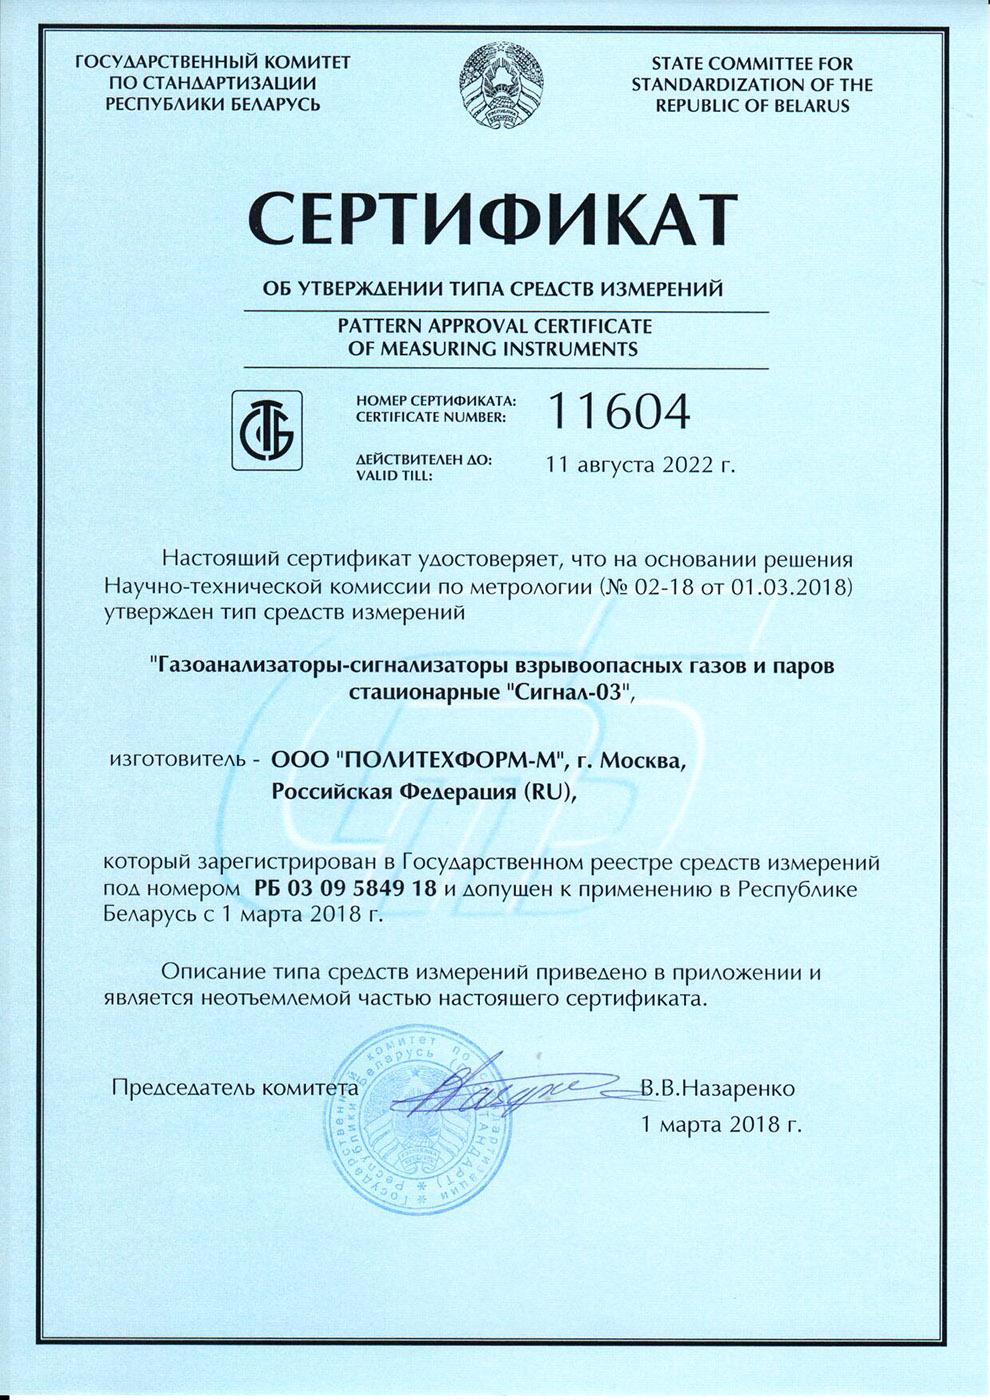 Сертификат описания типа газоанализатор сигнал-03